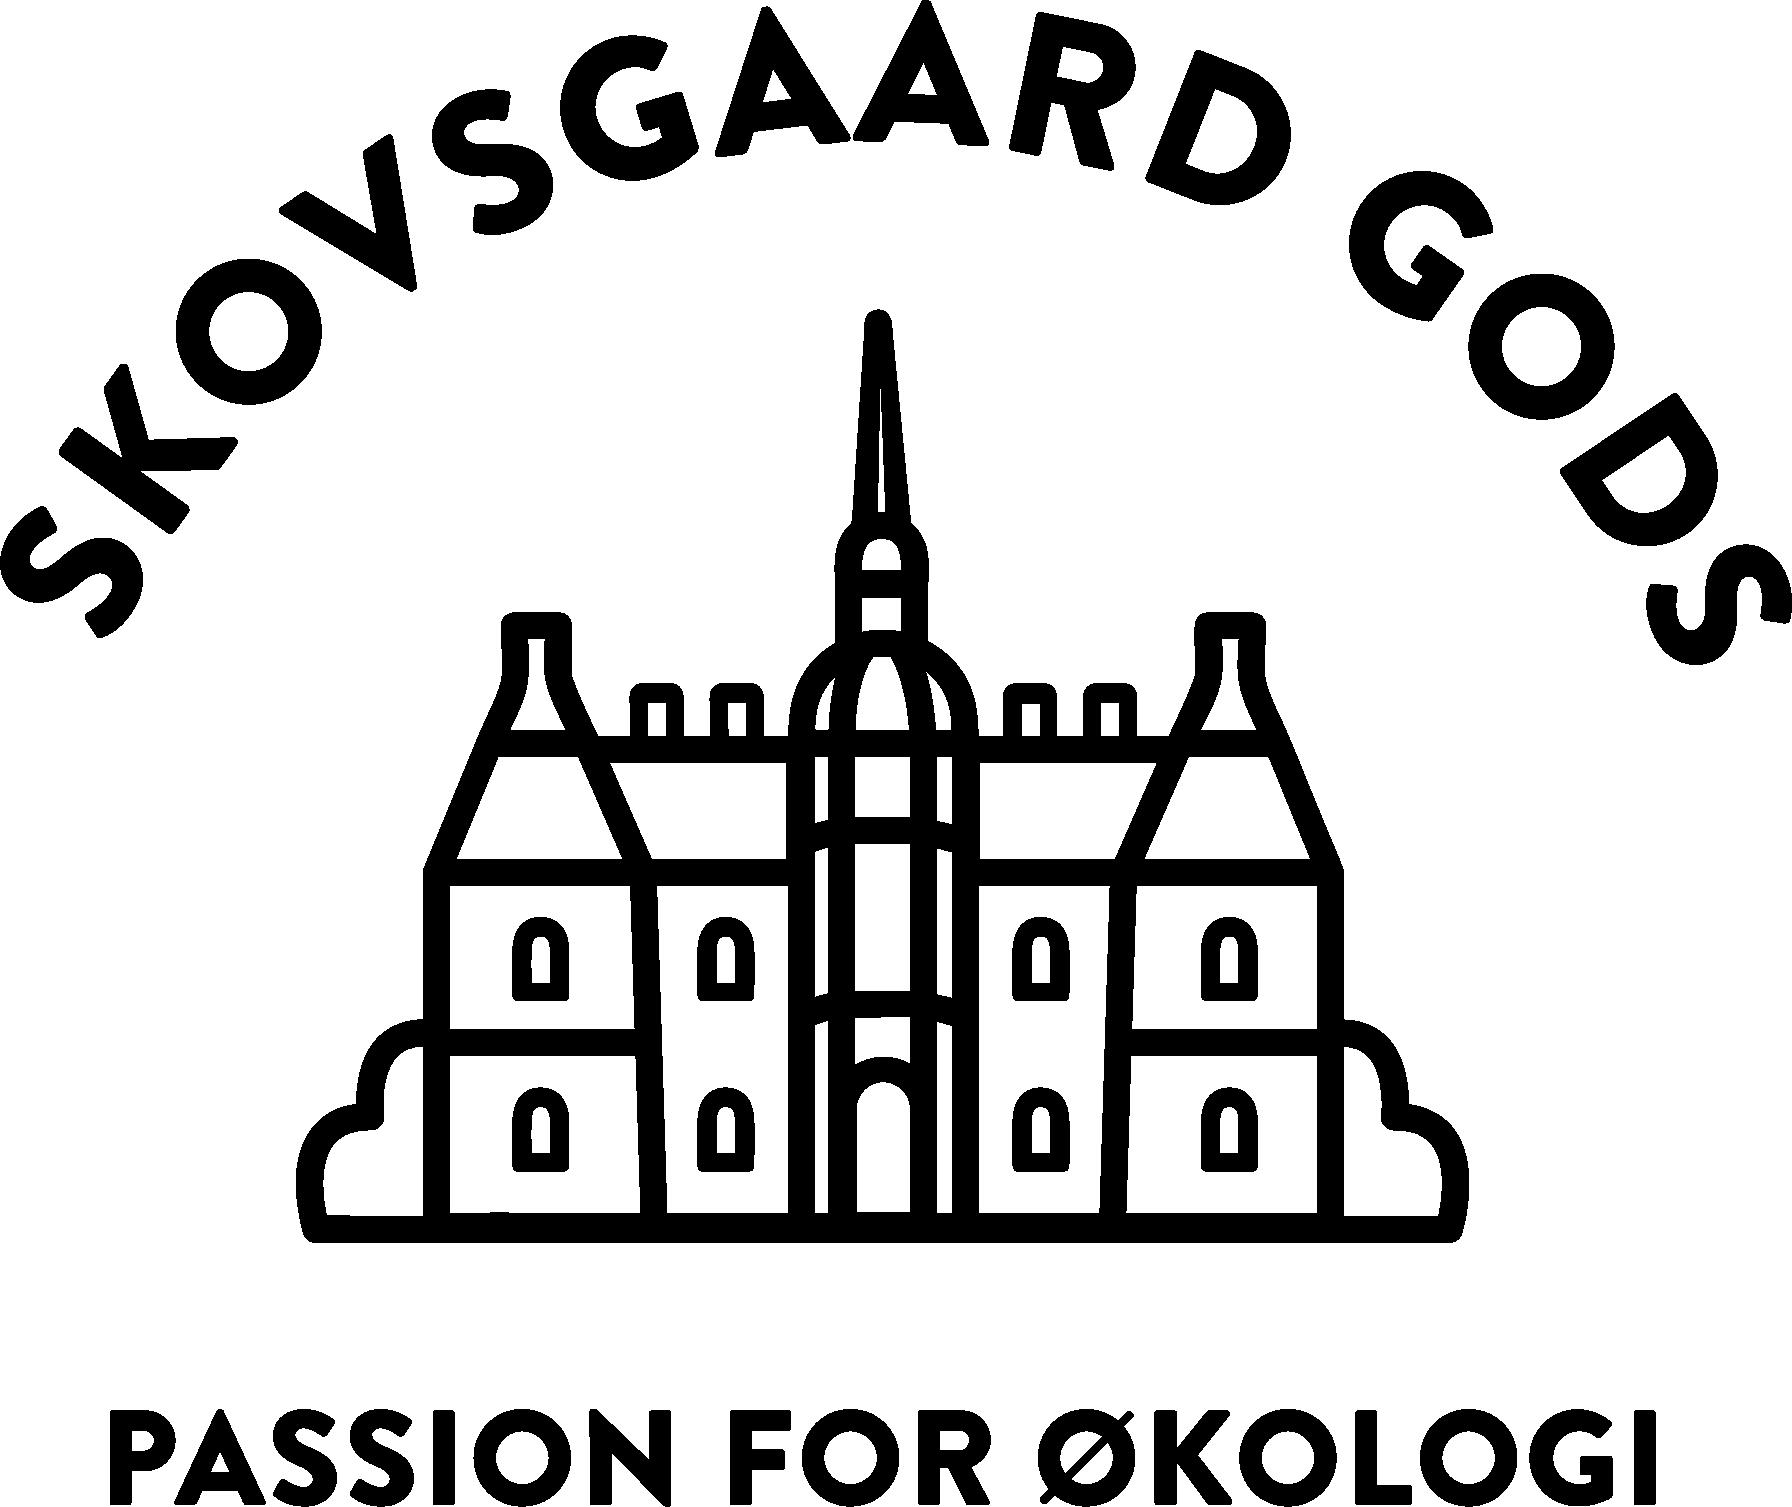 12b9fc1c582 Kågårdsvej 10, 5900 Rudkøbing